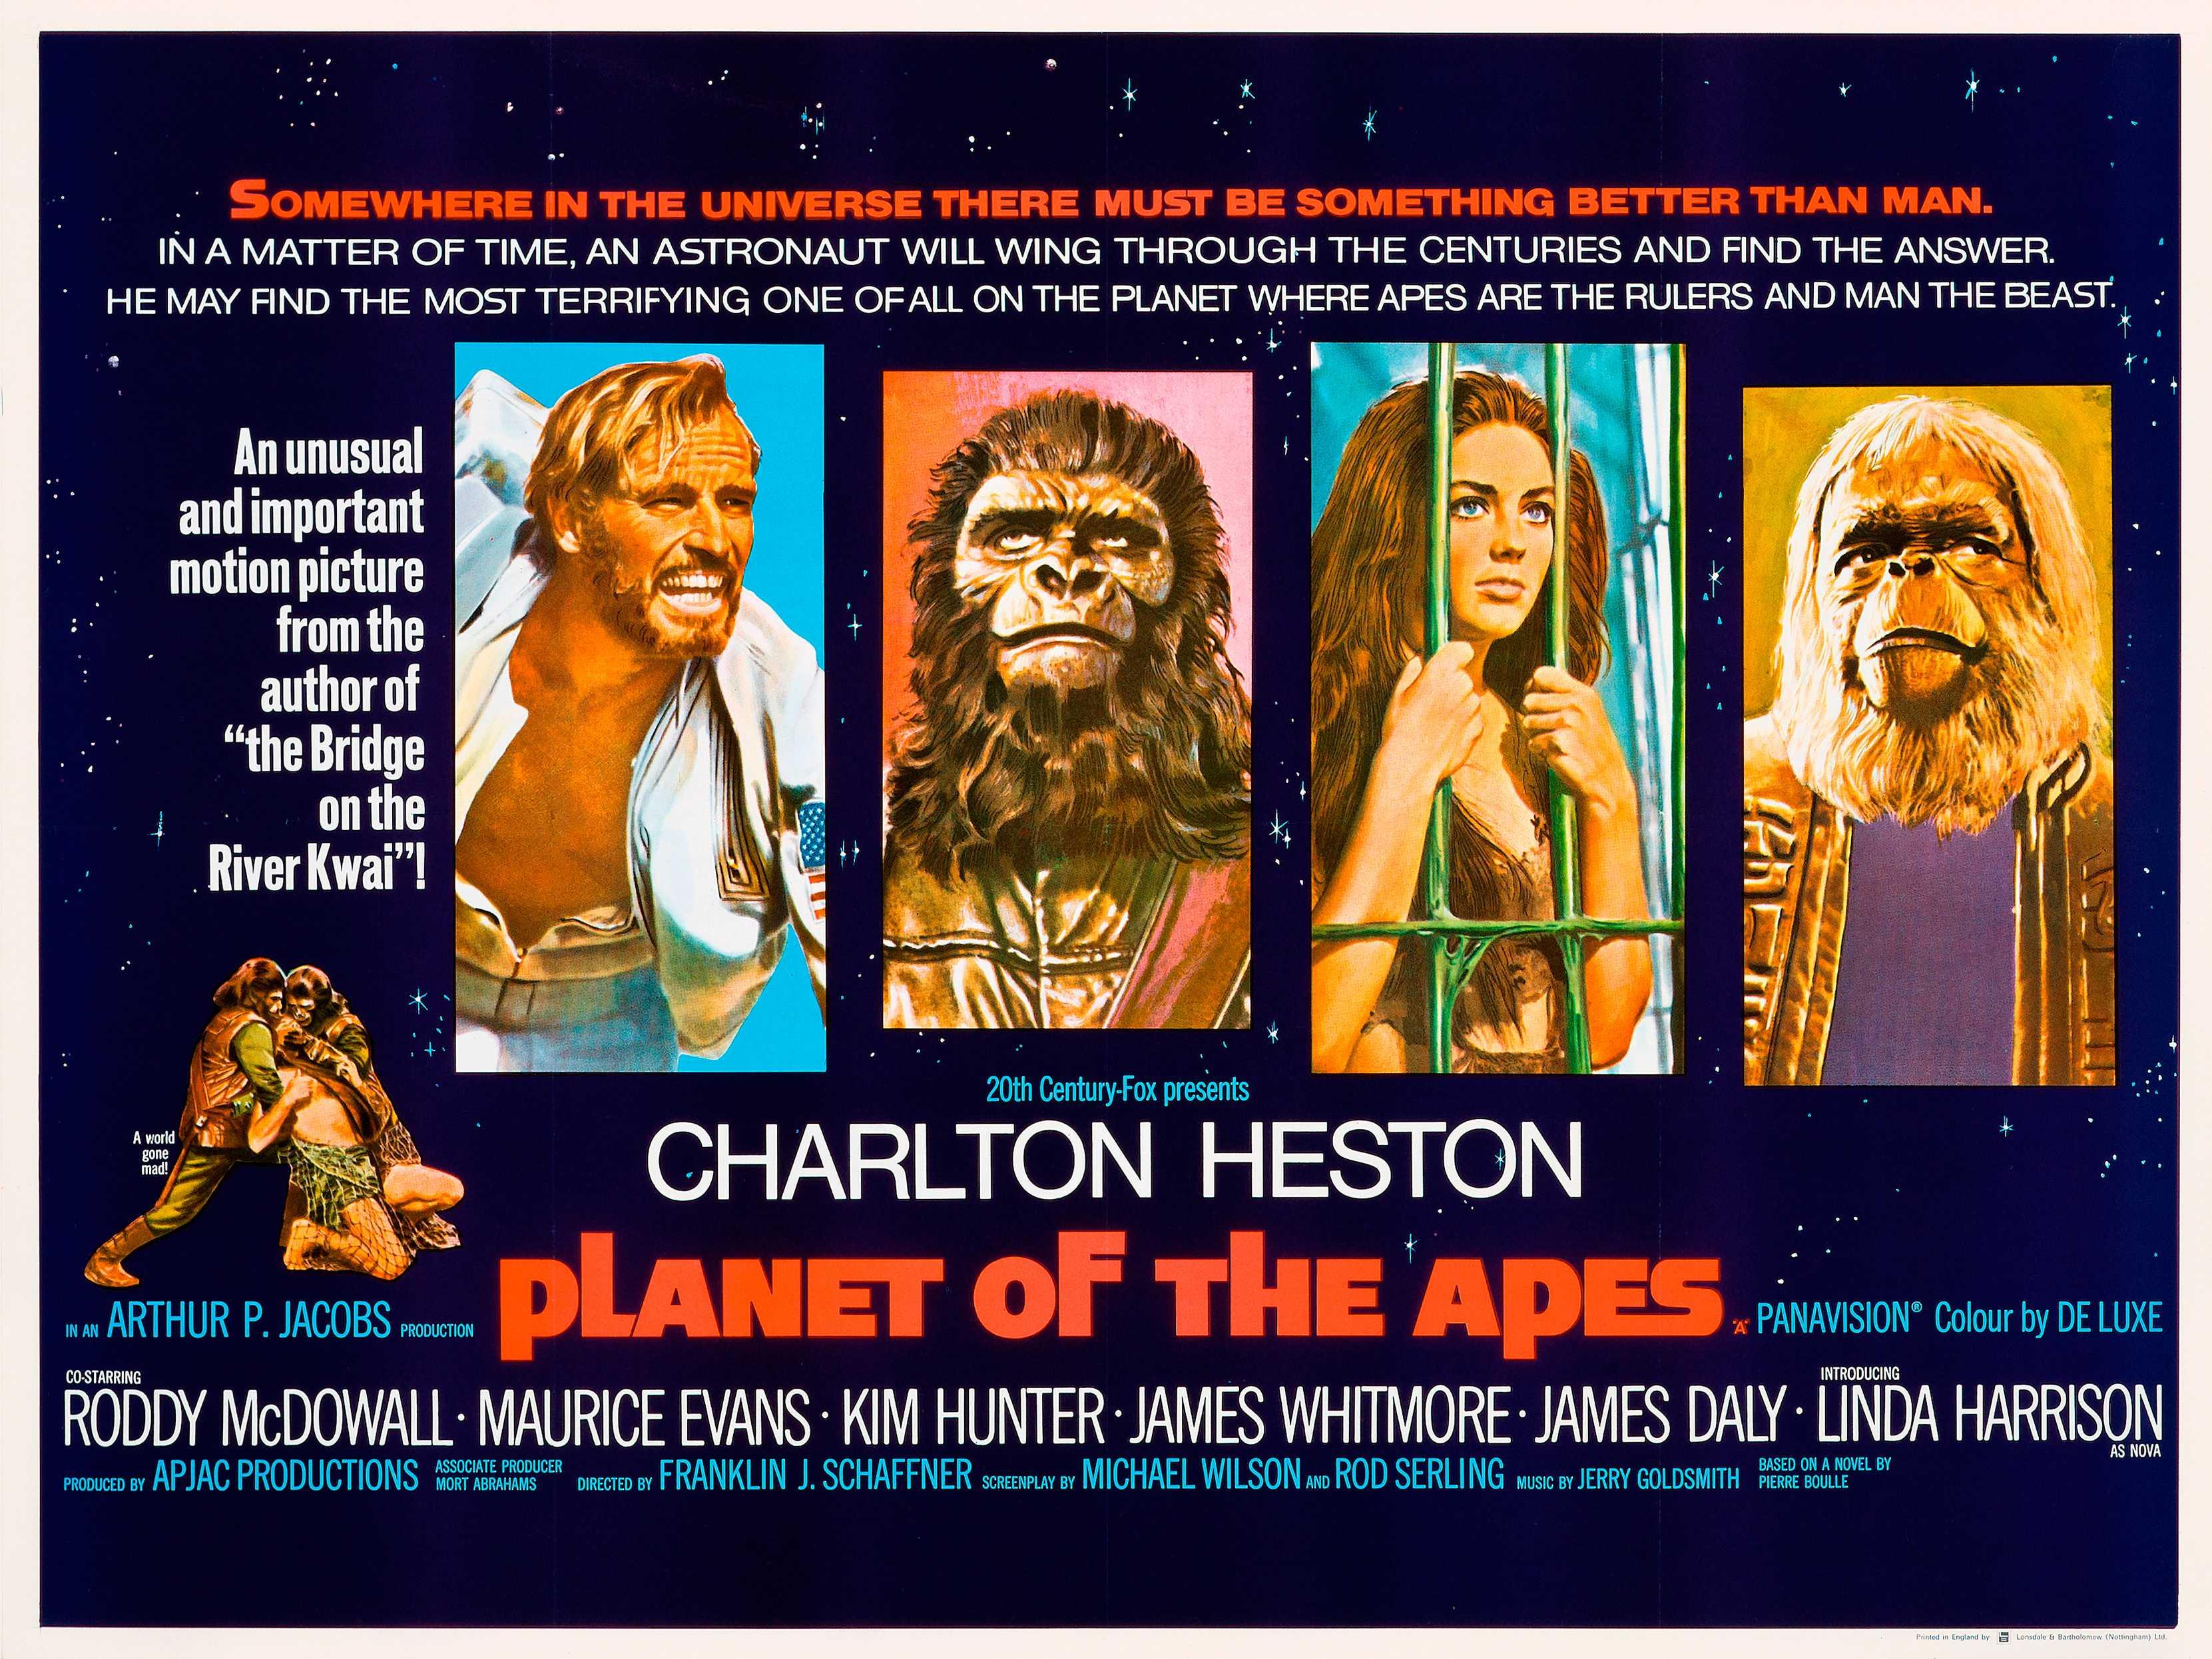 planet of the apes retro movie posterretro movie poster